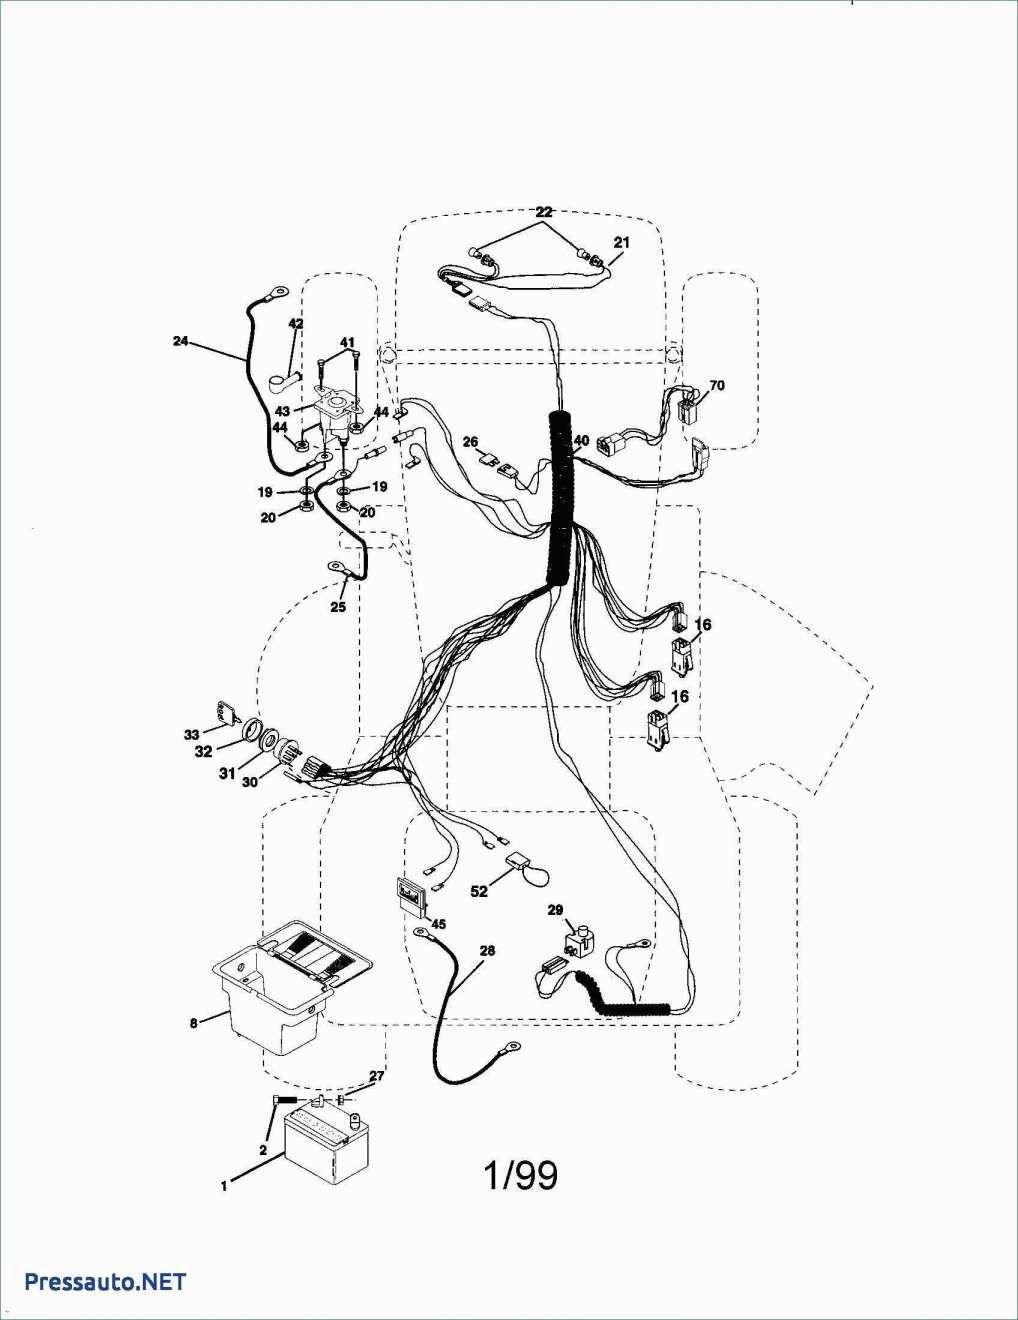 Kohler Wiring Diagram from i.pinimg.com